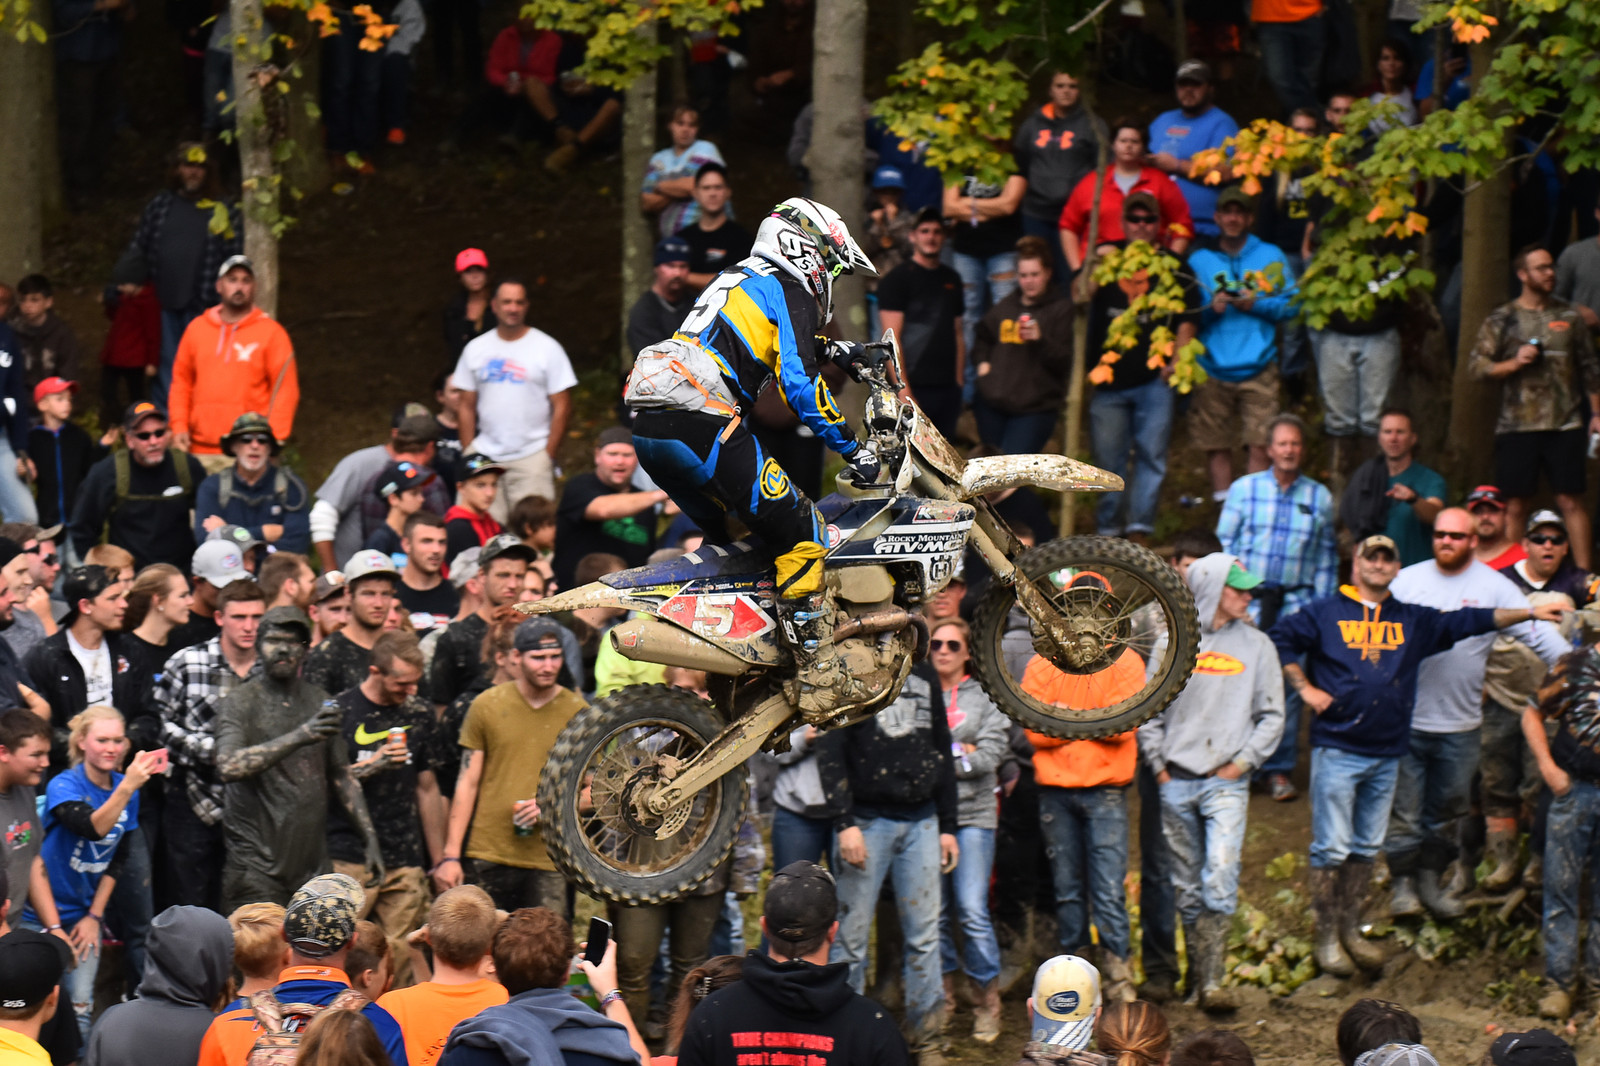 Thad Duvall - Powerline Park GNCC - Motocross Pictures - Vital MX